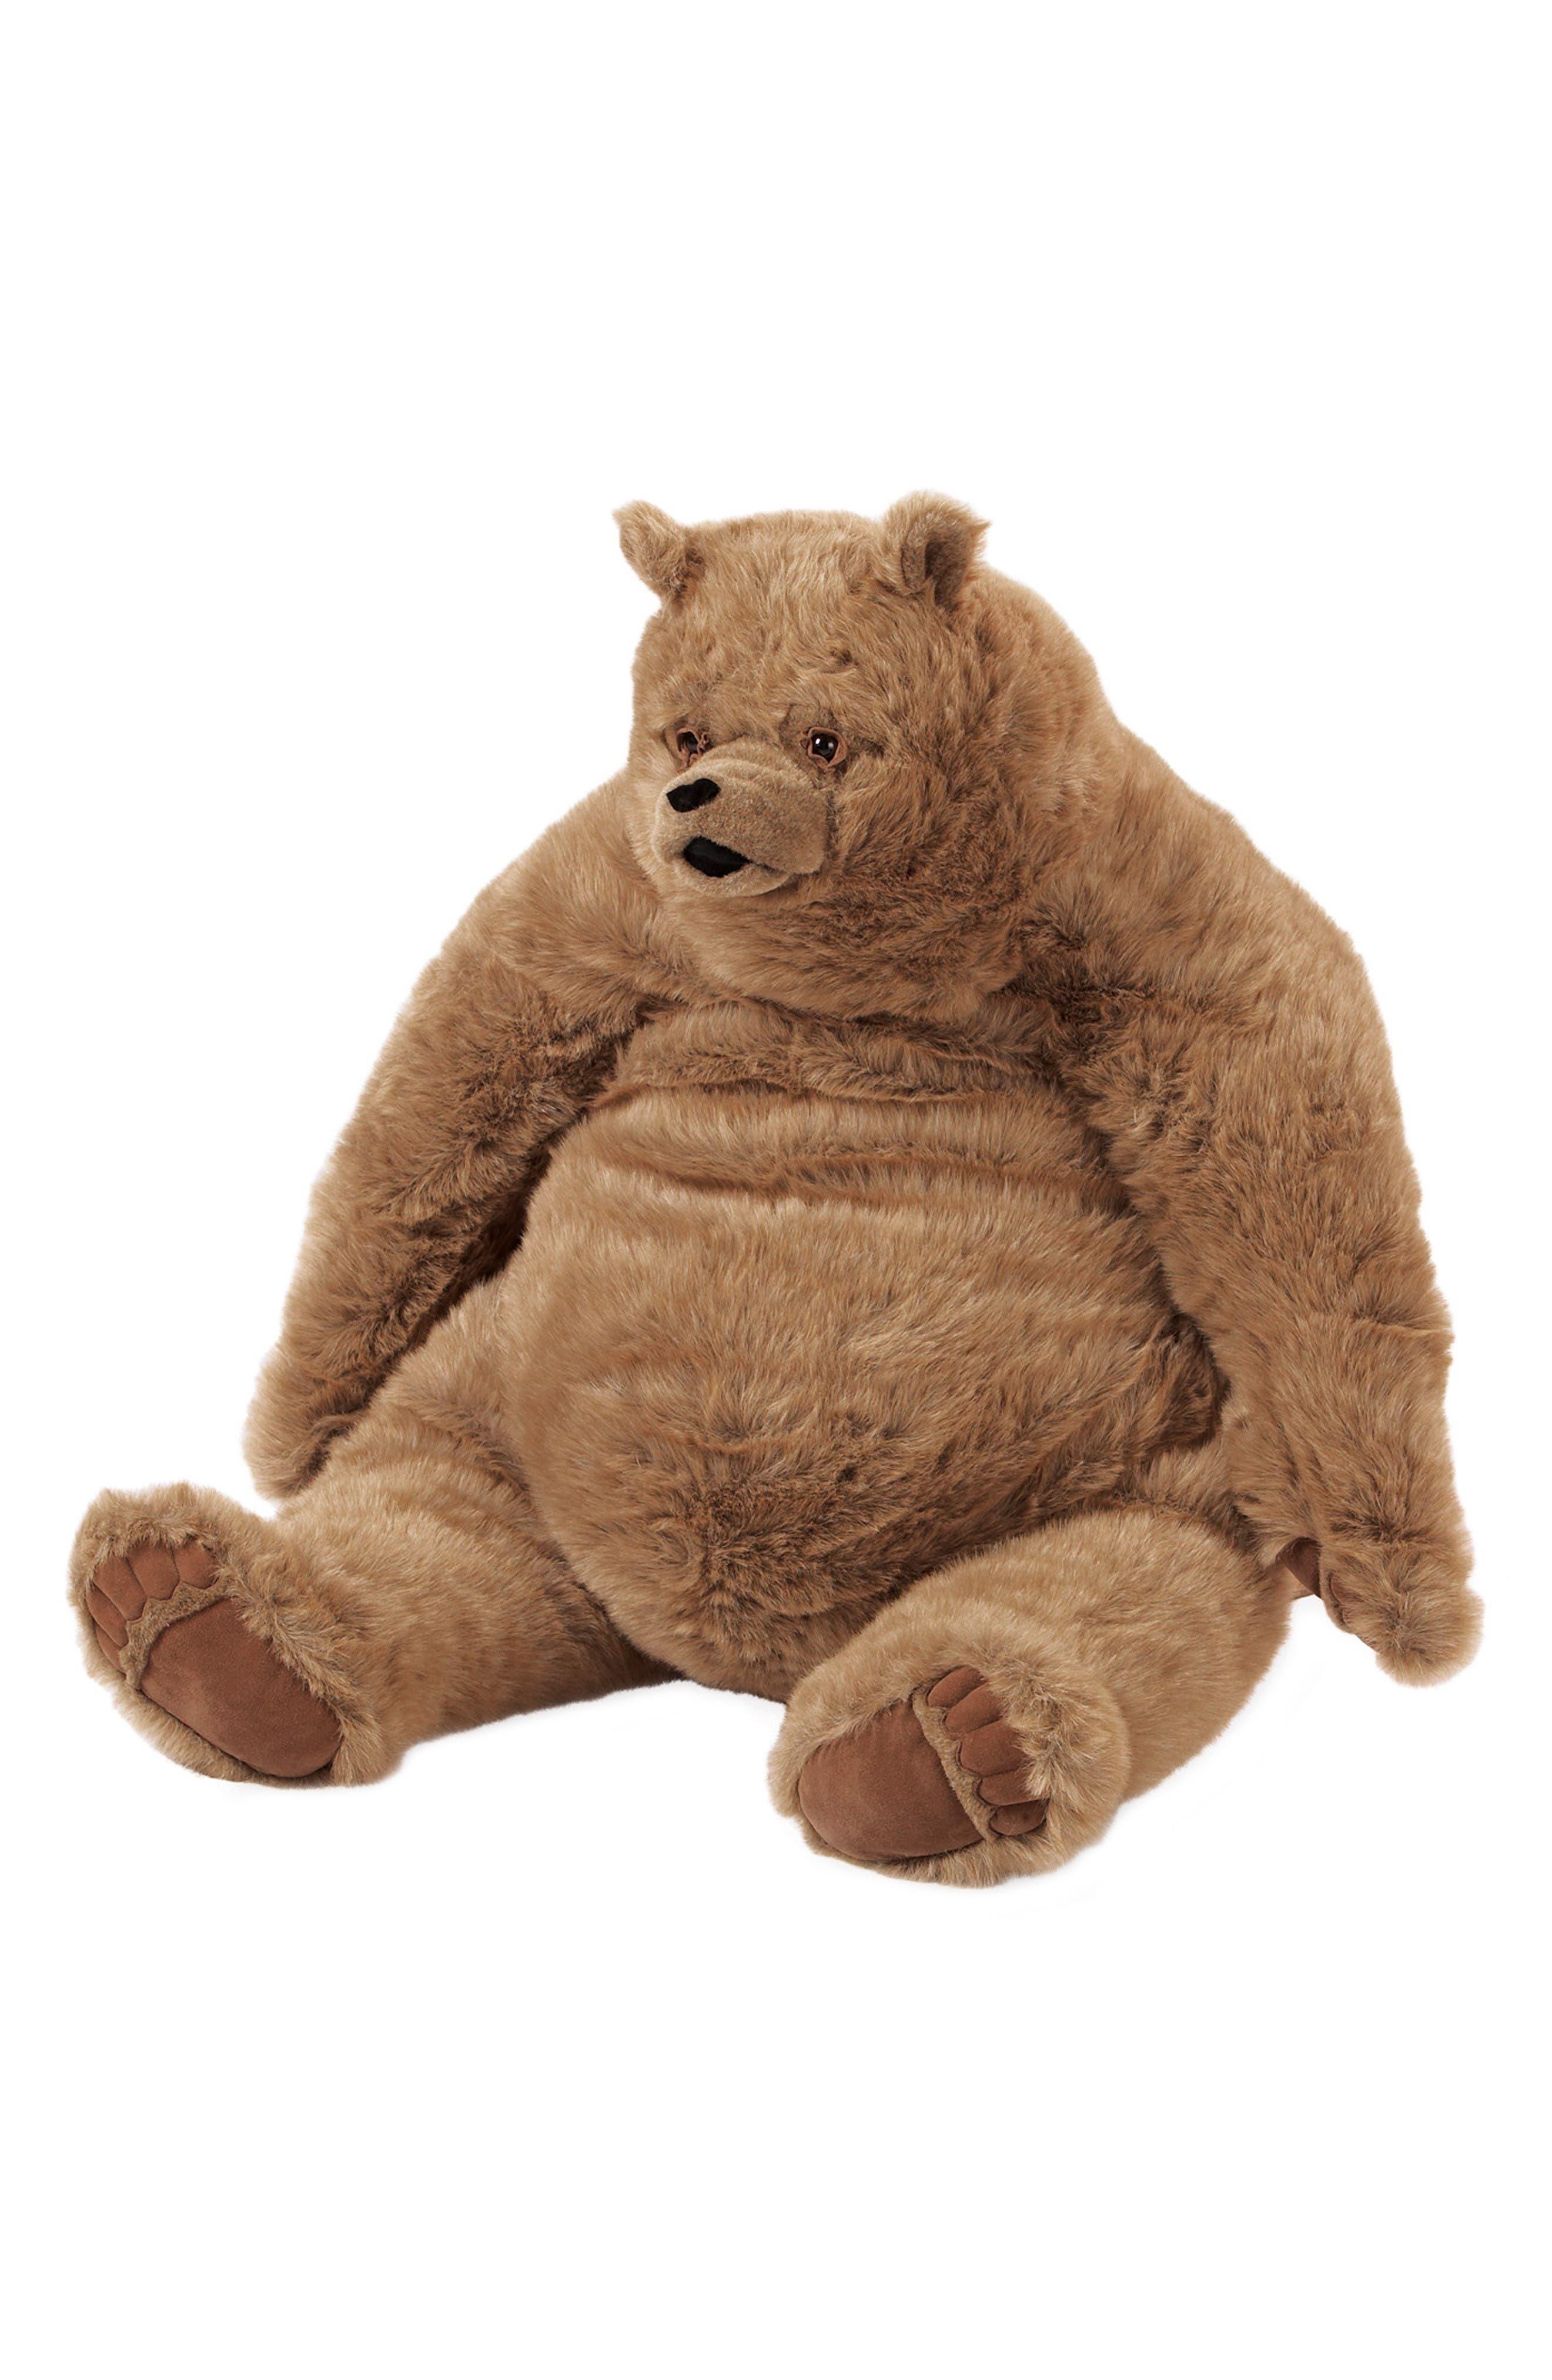 Alternate Image 1 Selected - Manhattan Toy Jumbo Kodiak Bear Stuffed Animal